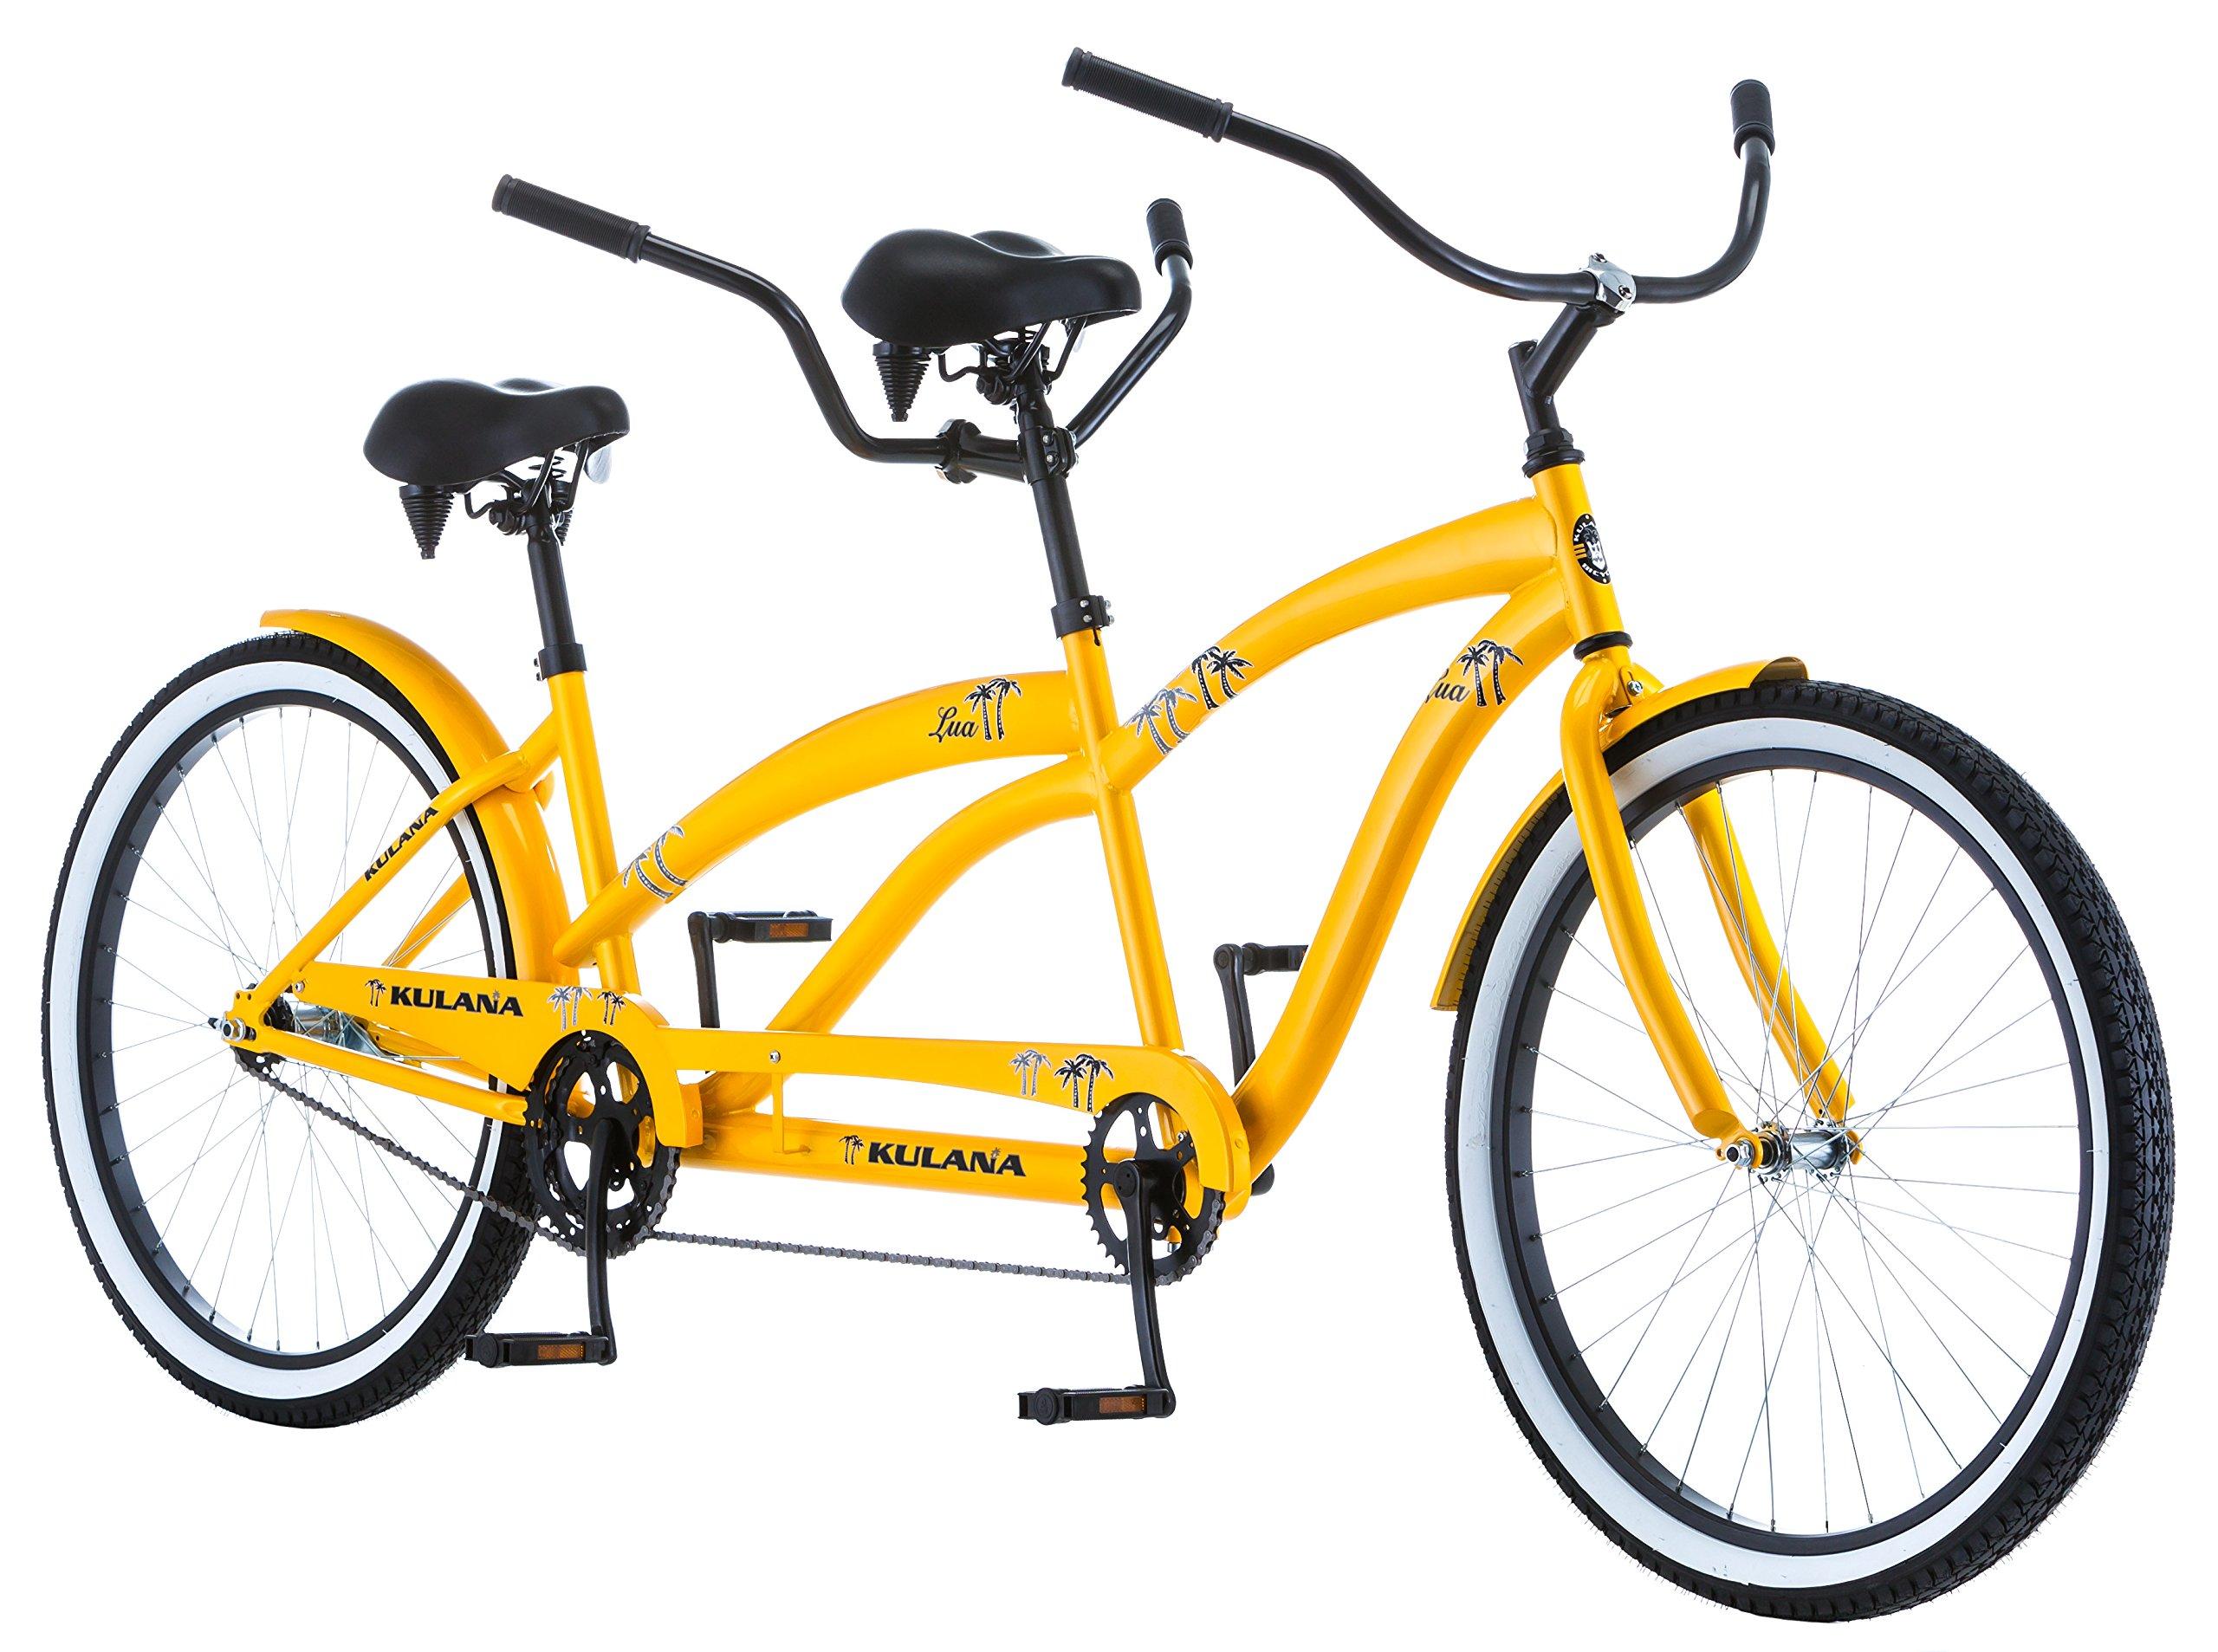 Kulana Lua Single Speed Tandem 26'' wheel, Yellow, 17''/Medium frame size by Kulana